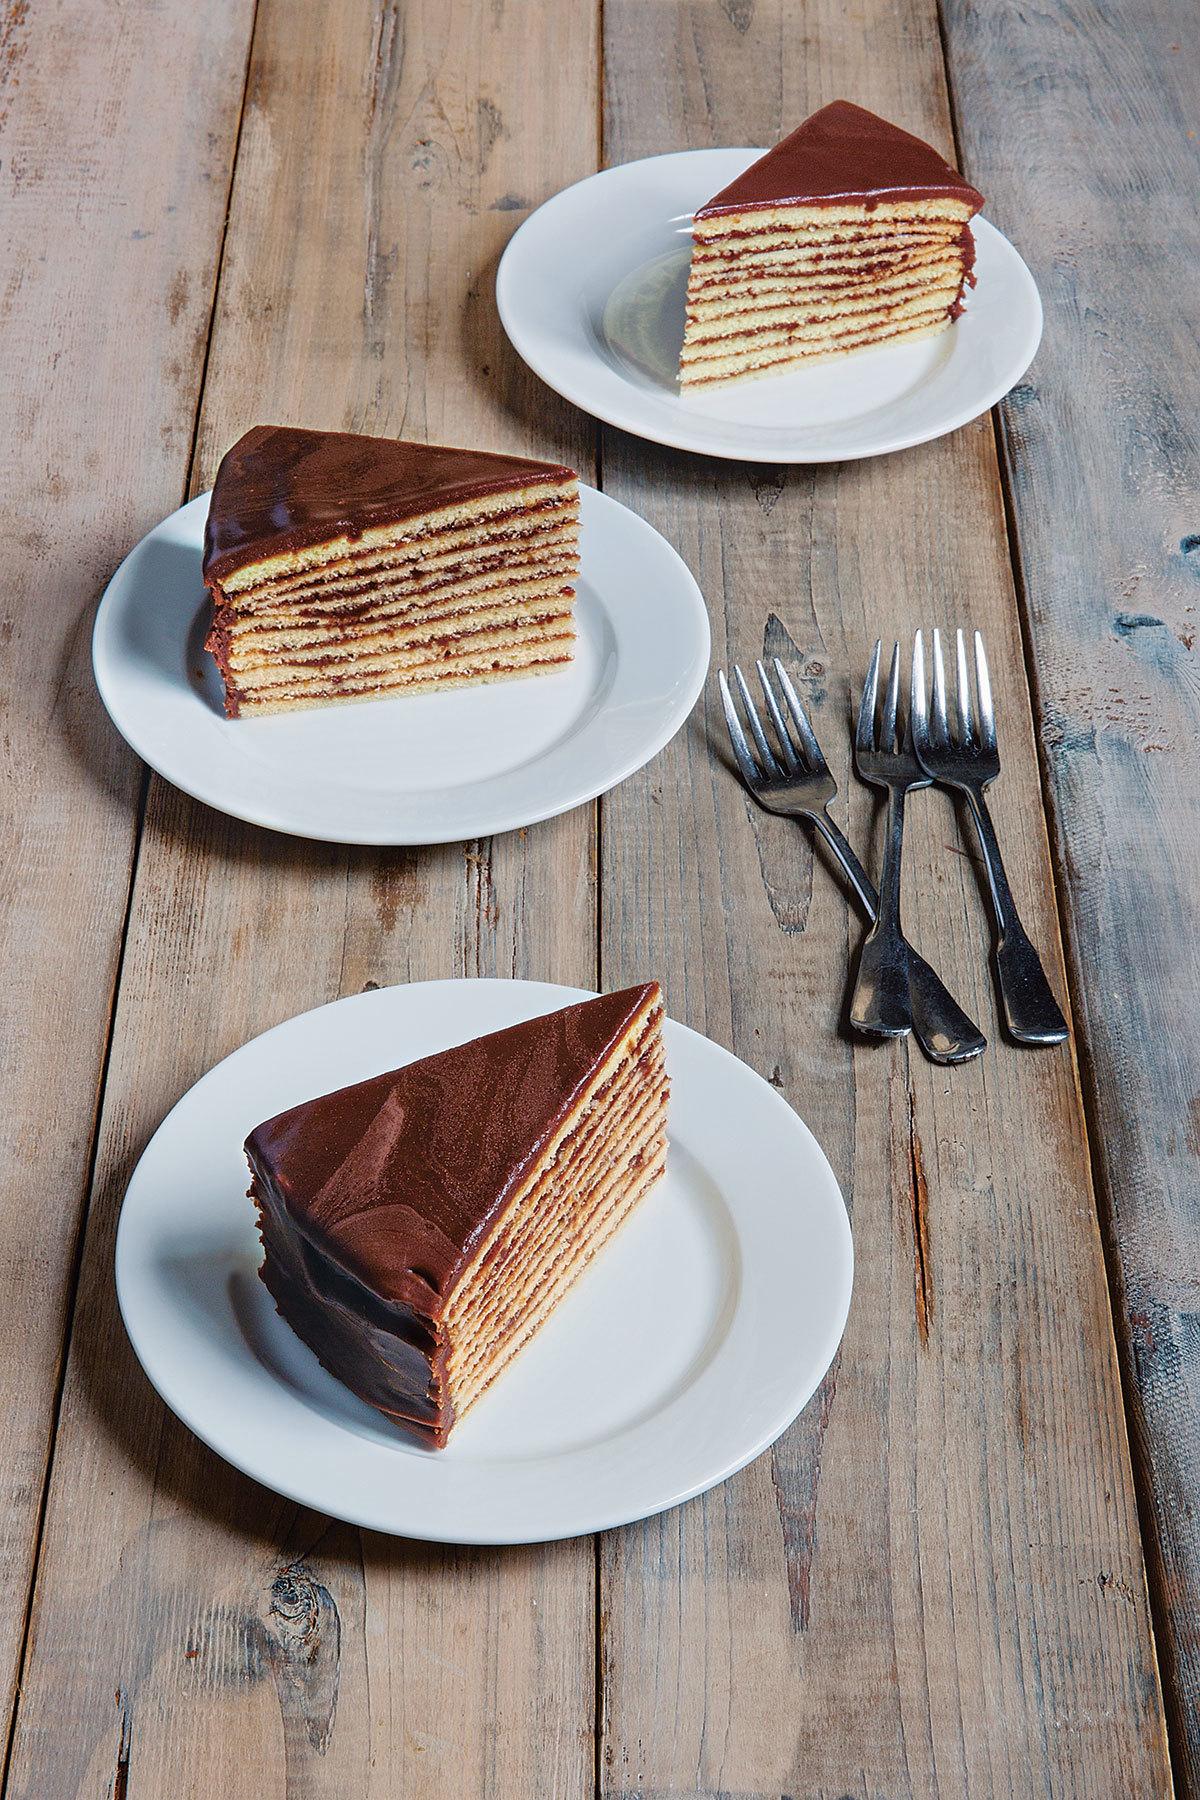 319-Smith-Island-cake.jpg#asset:54073